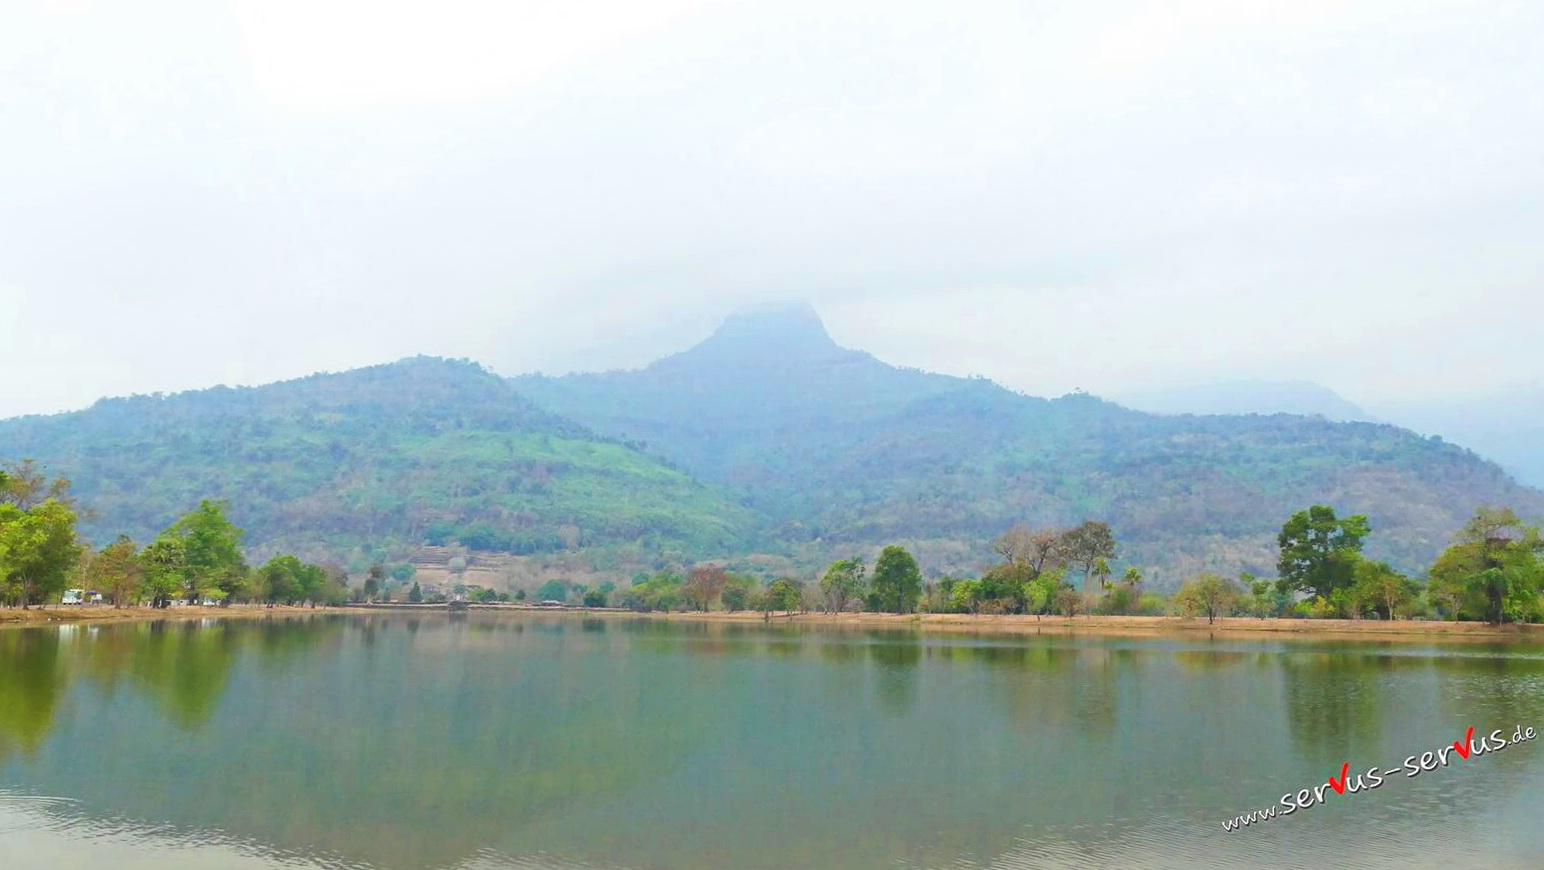 Der heilige Berg Phu Kao am Vat Phou, Laos, Champasak